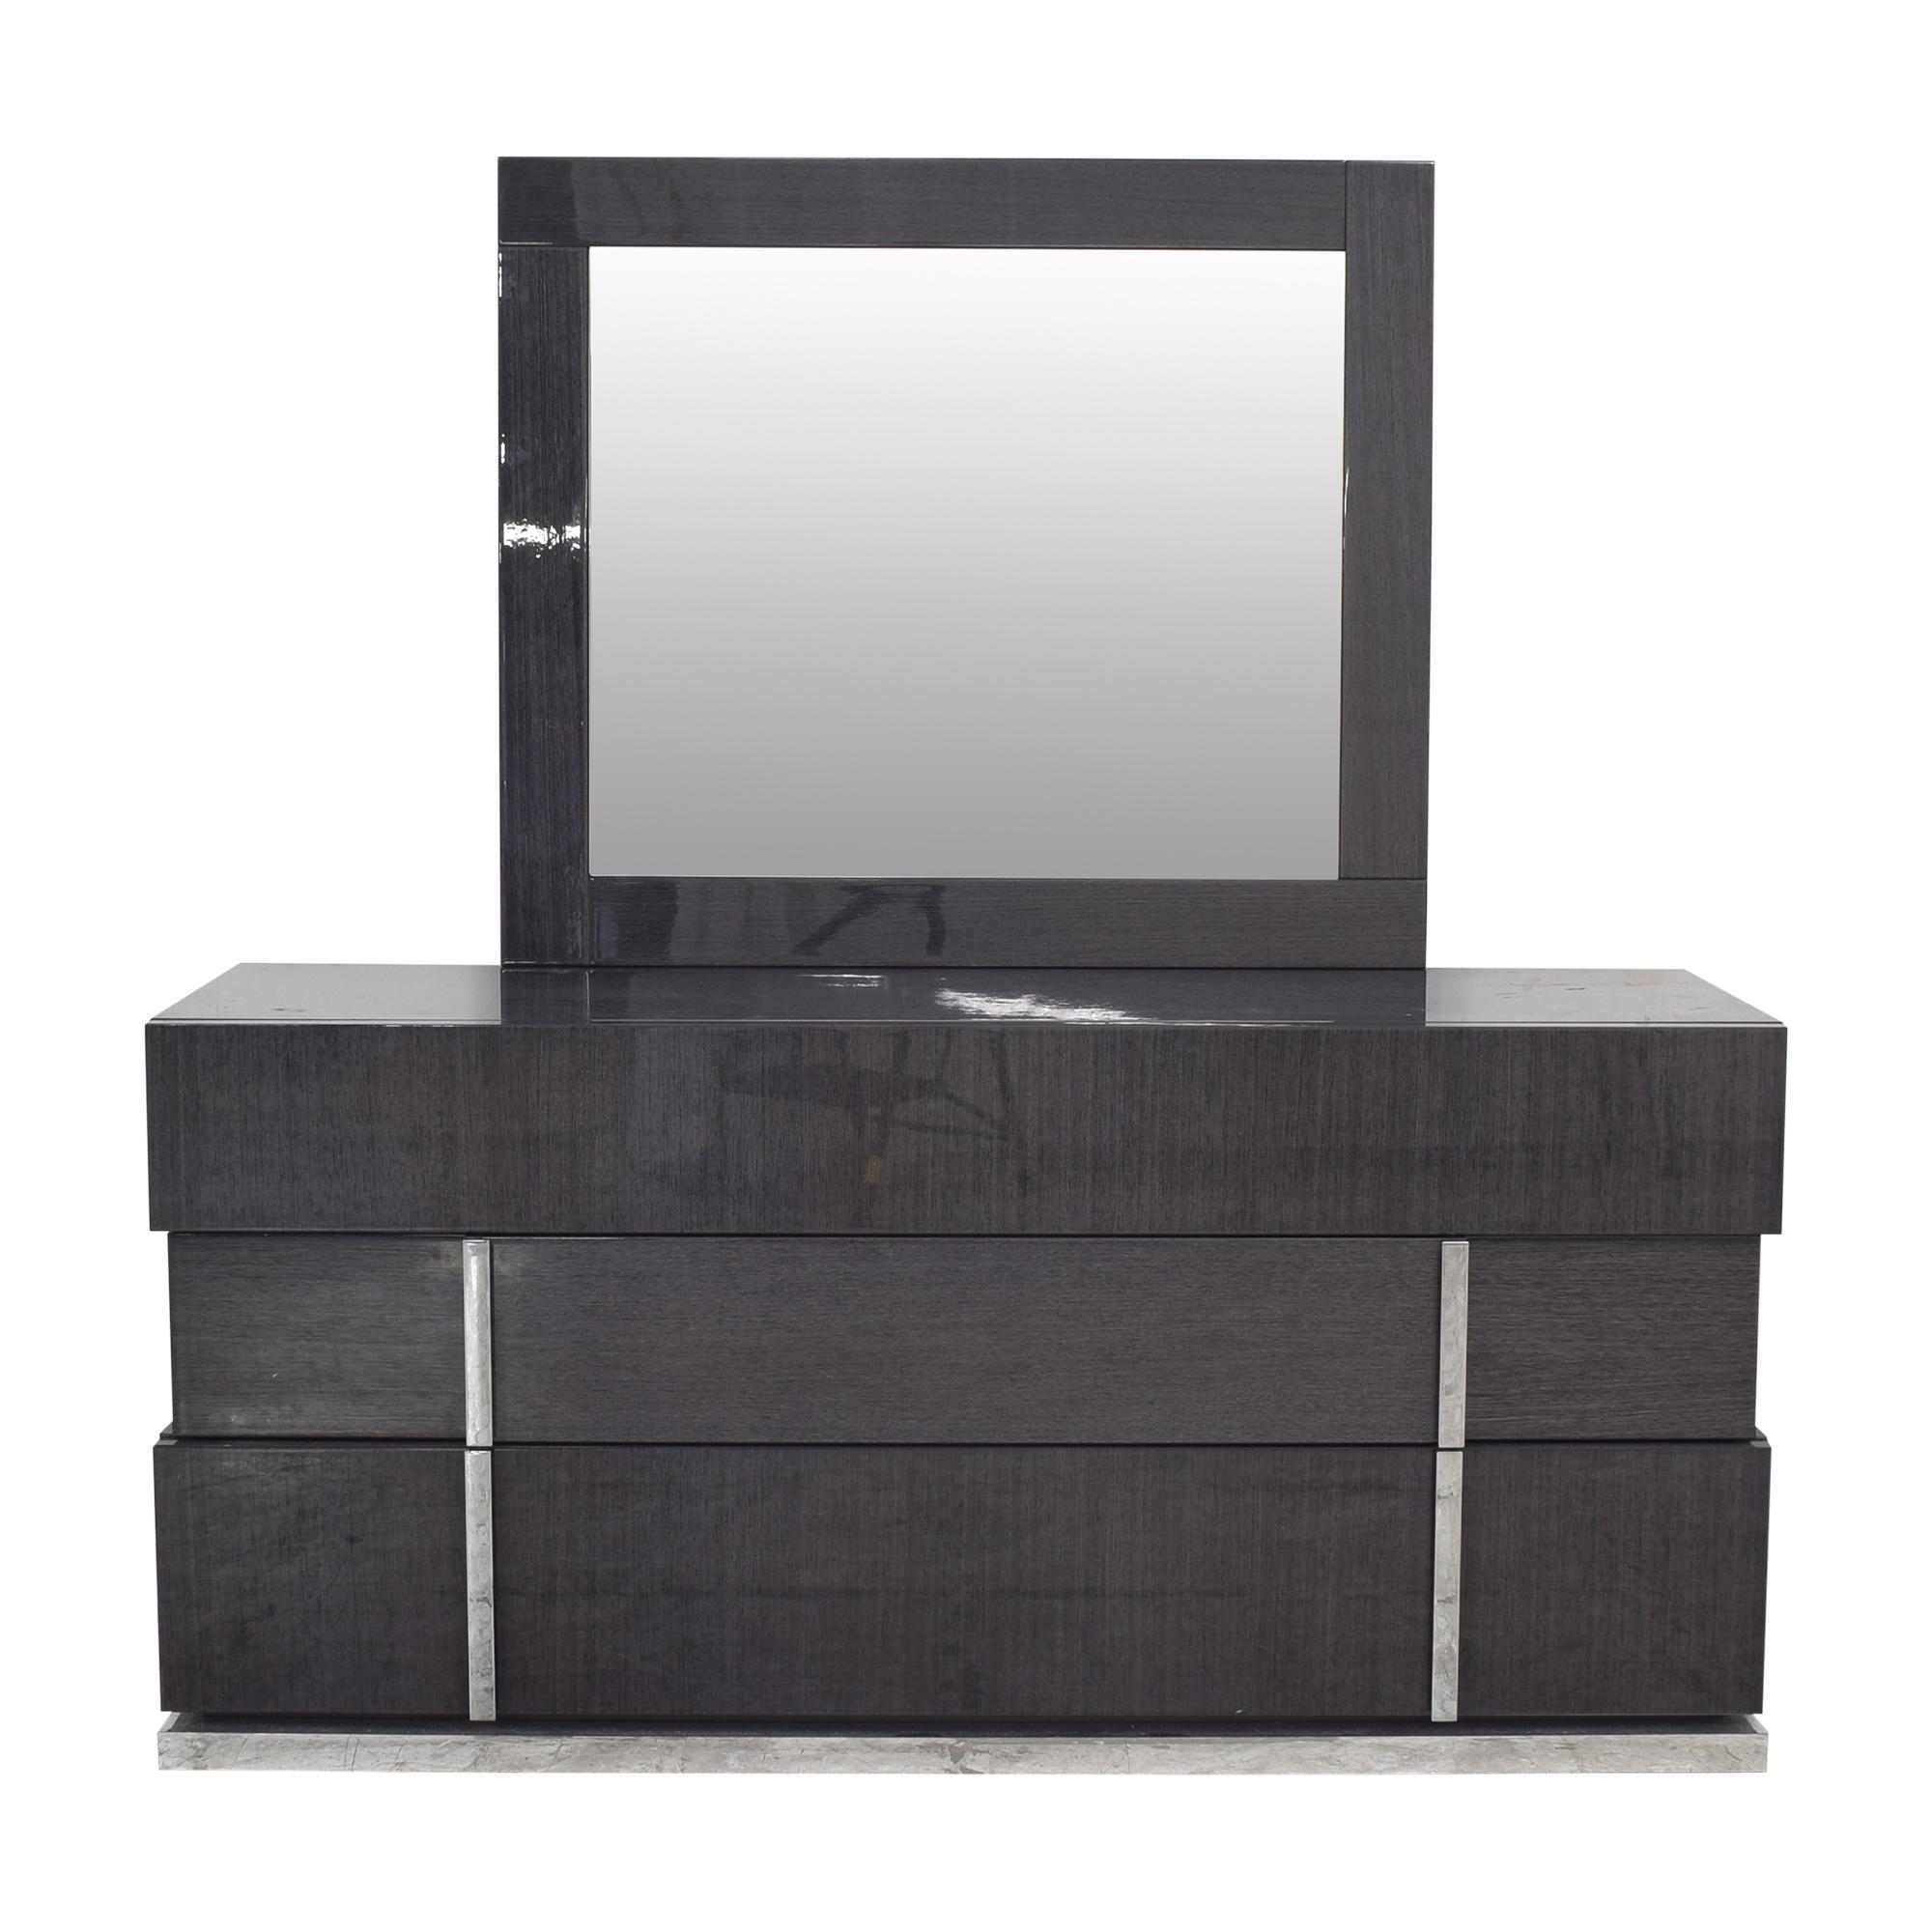 Alf Italia Alf Italia Montecarlo Dresser with Mirror coupon